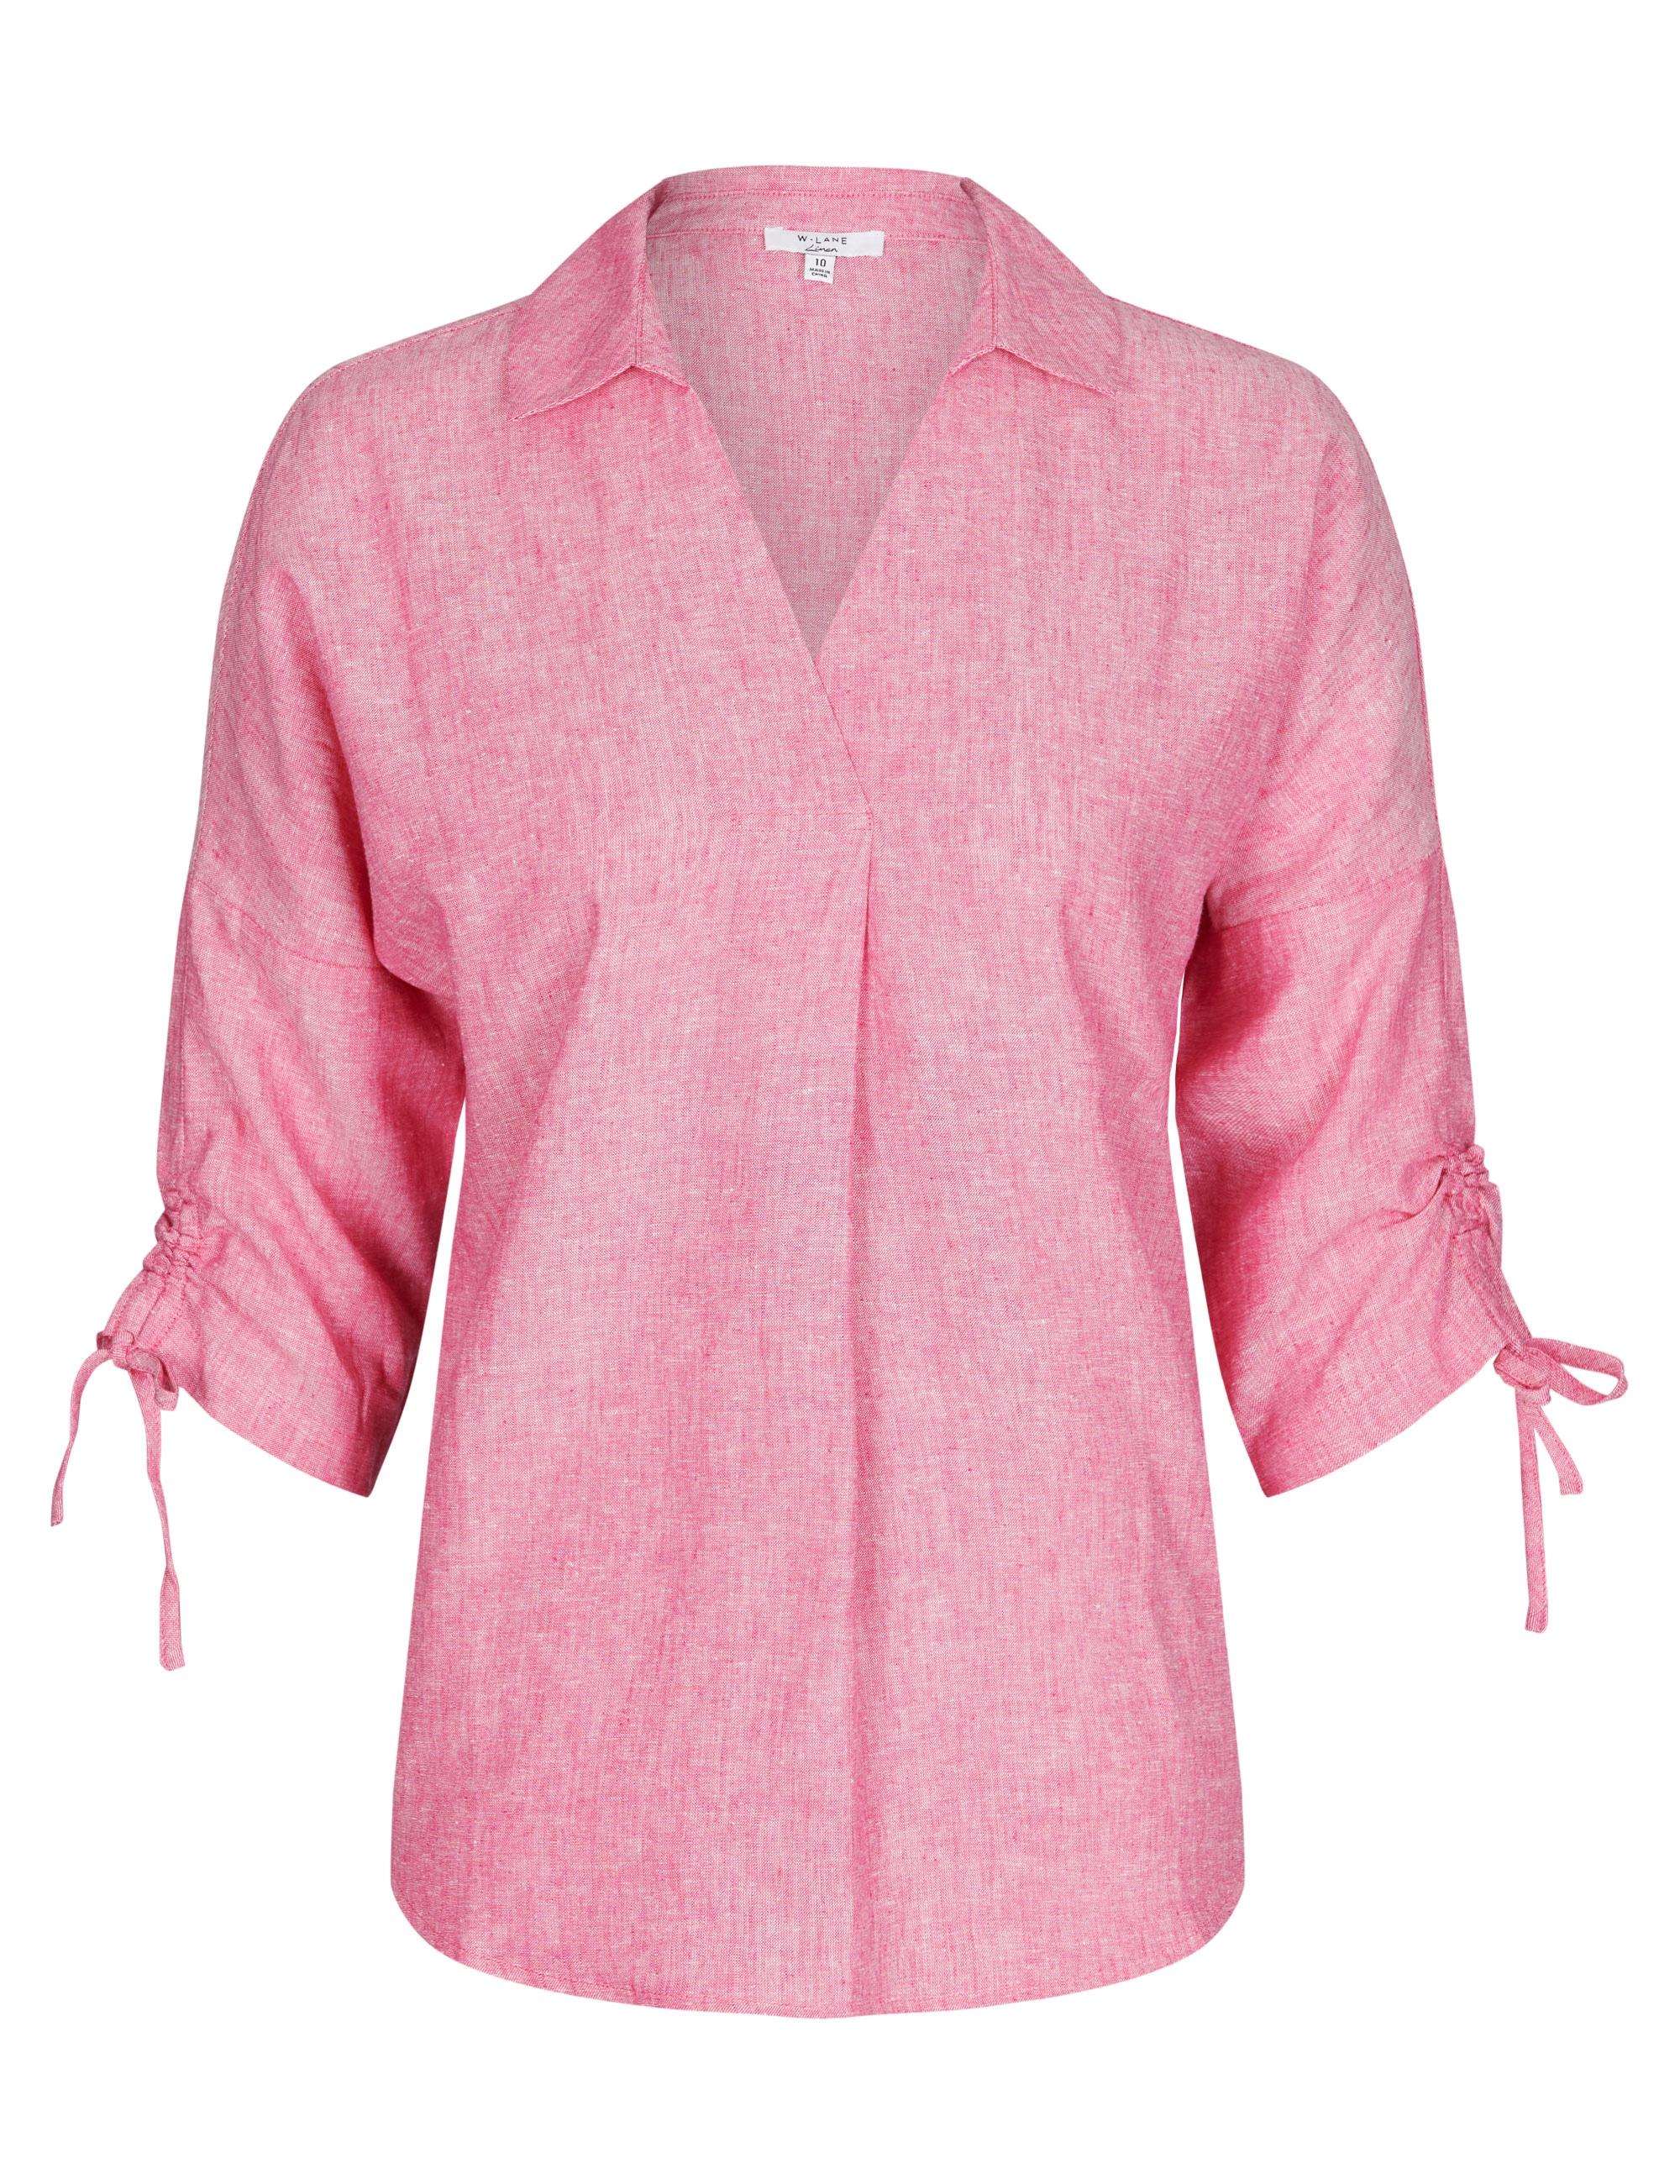 1055885651 2 - Women Fashion